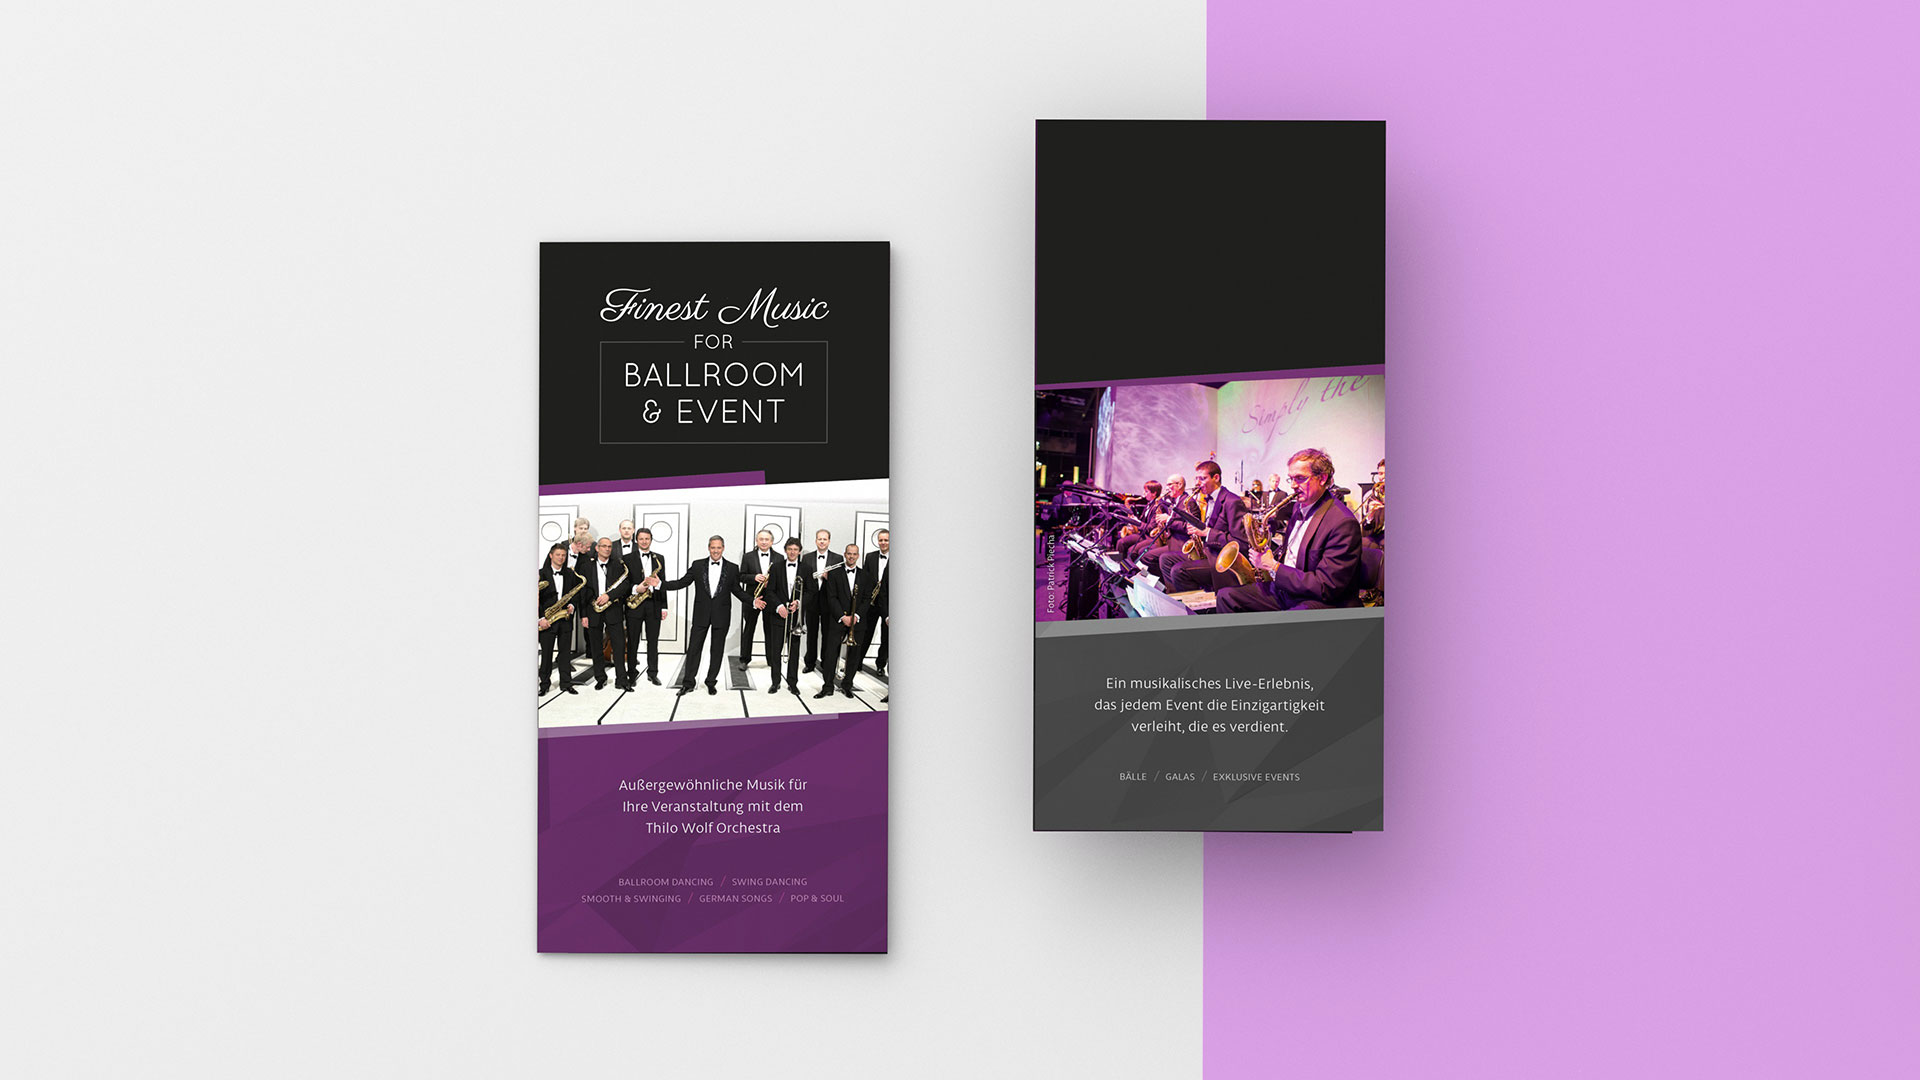 Flyer Finest Music for Ballromm & Event